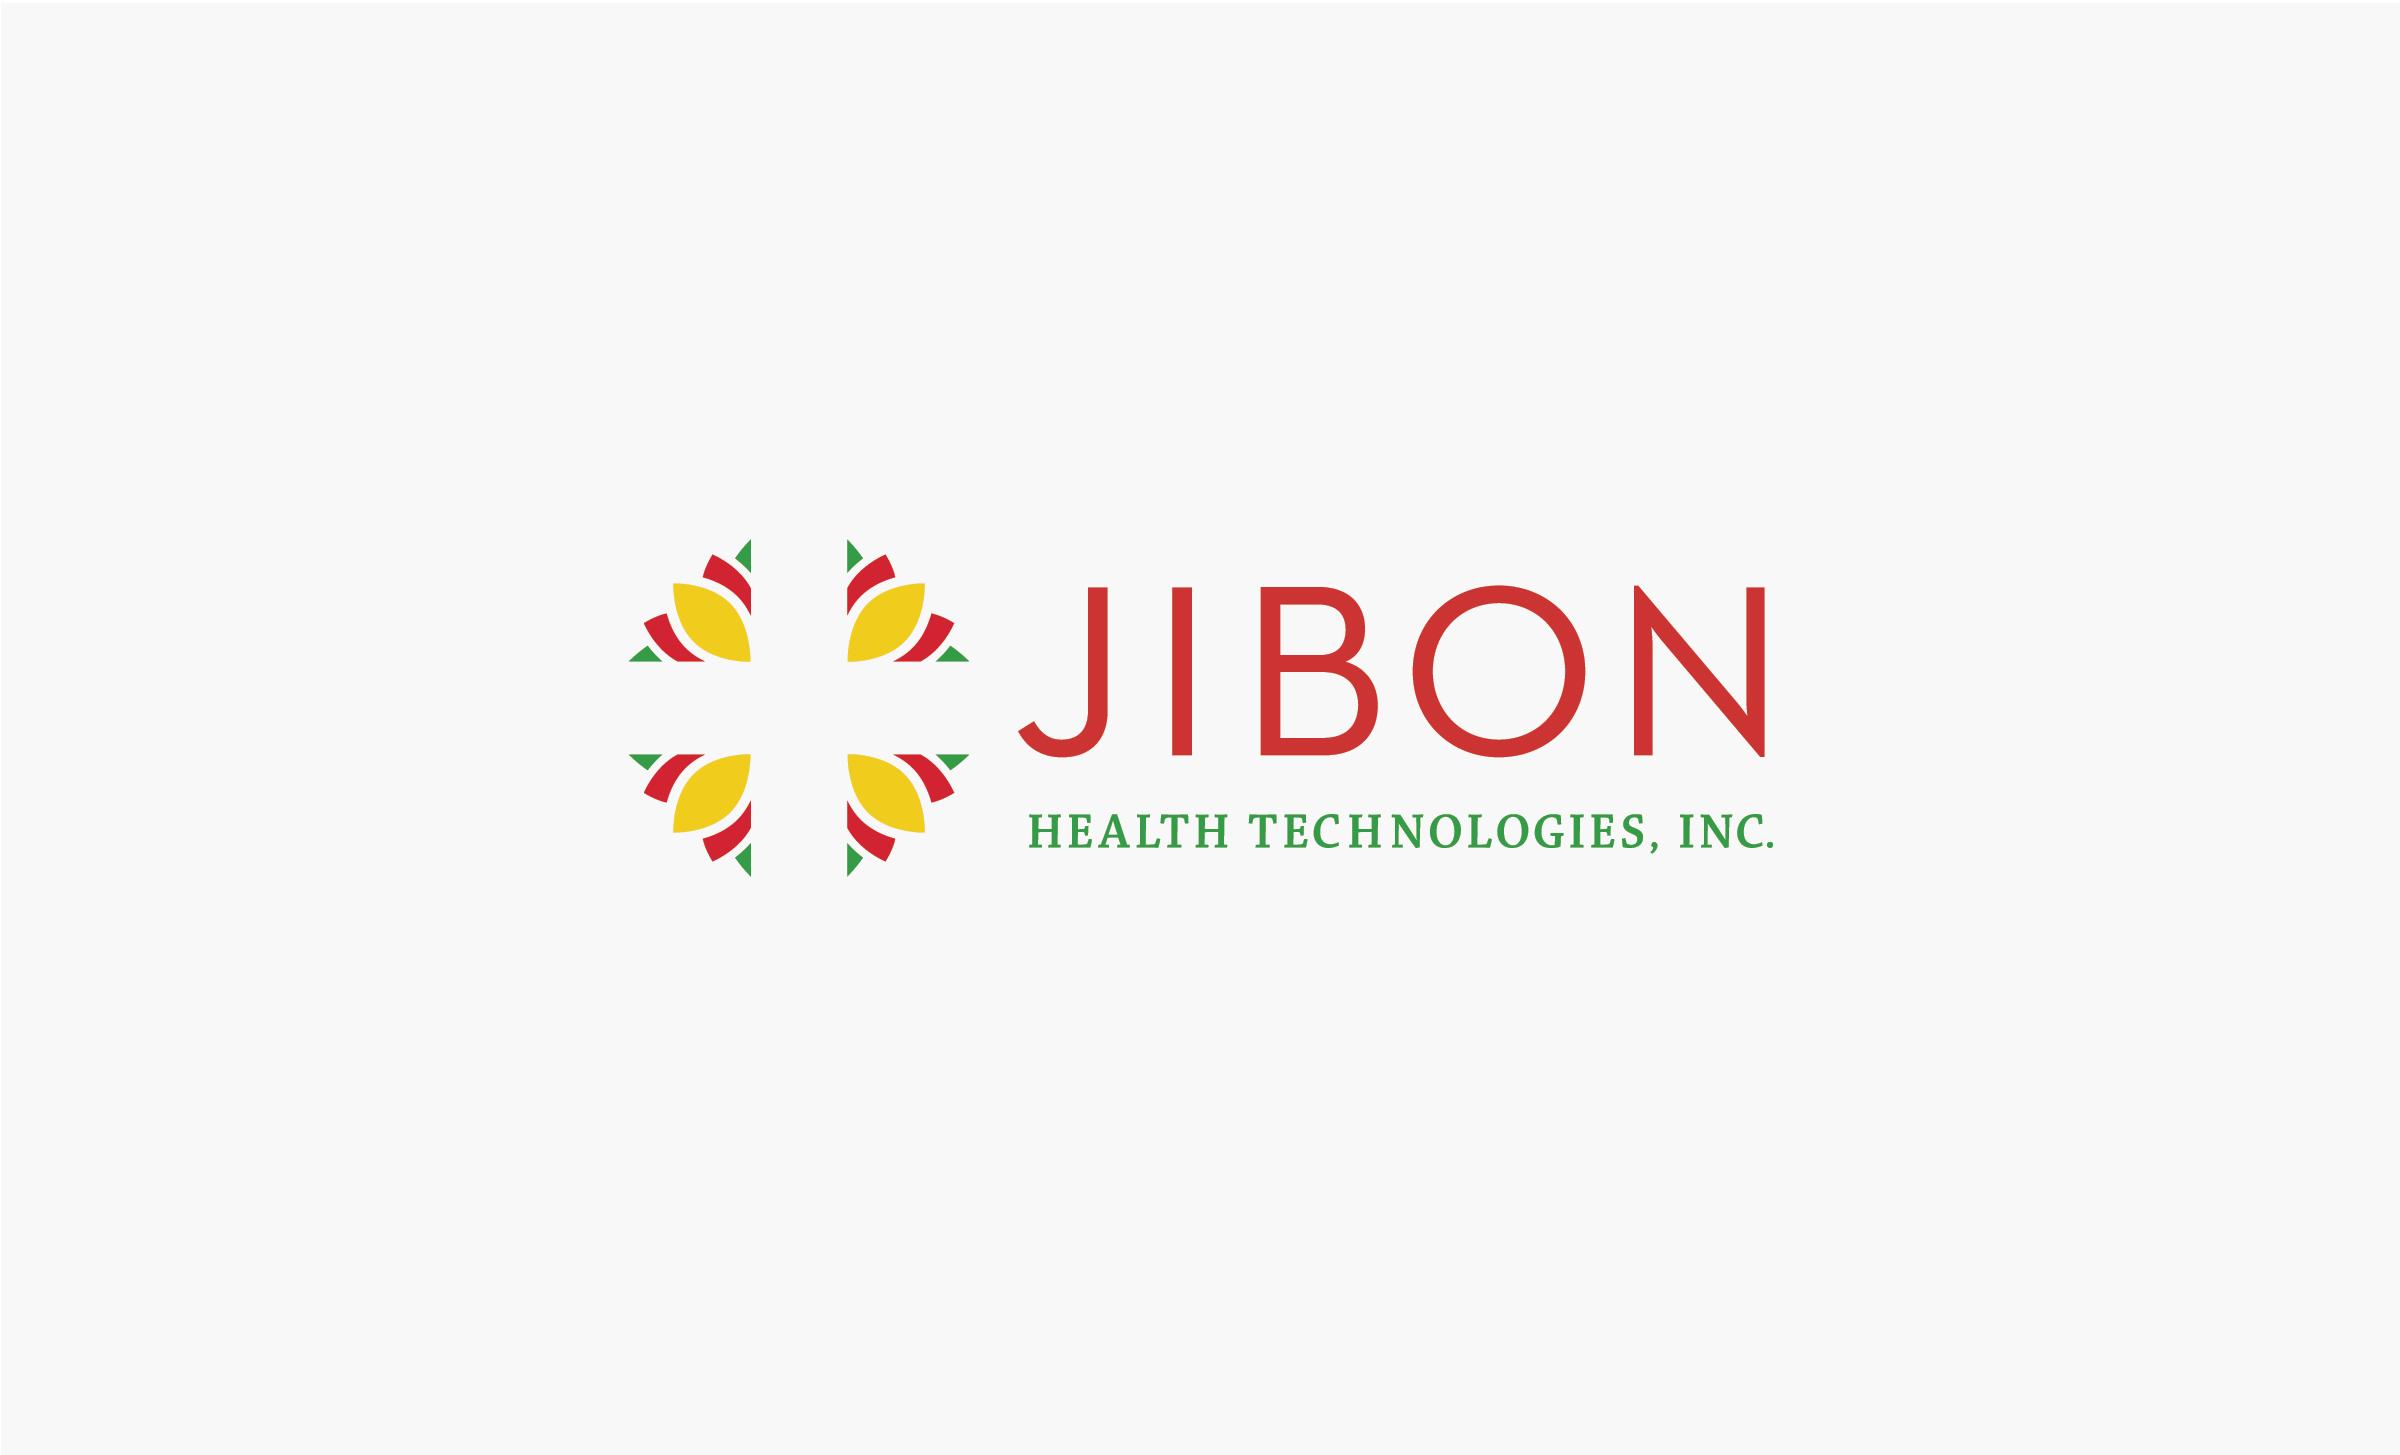 AnthonyElder_Website_Jibon_2.jpg